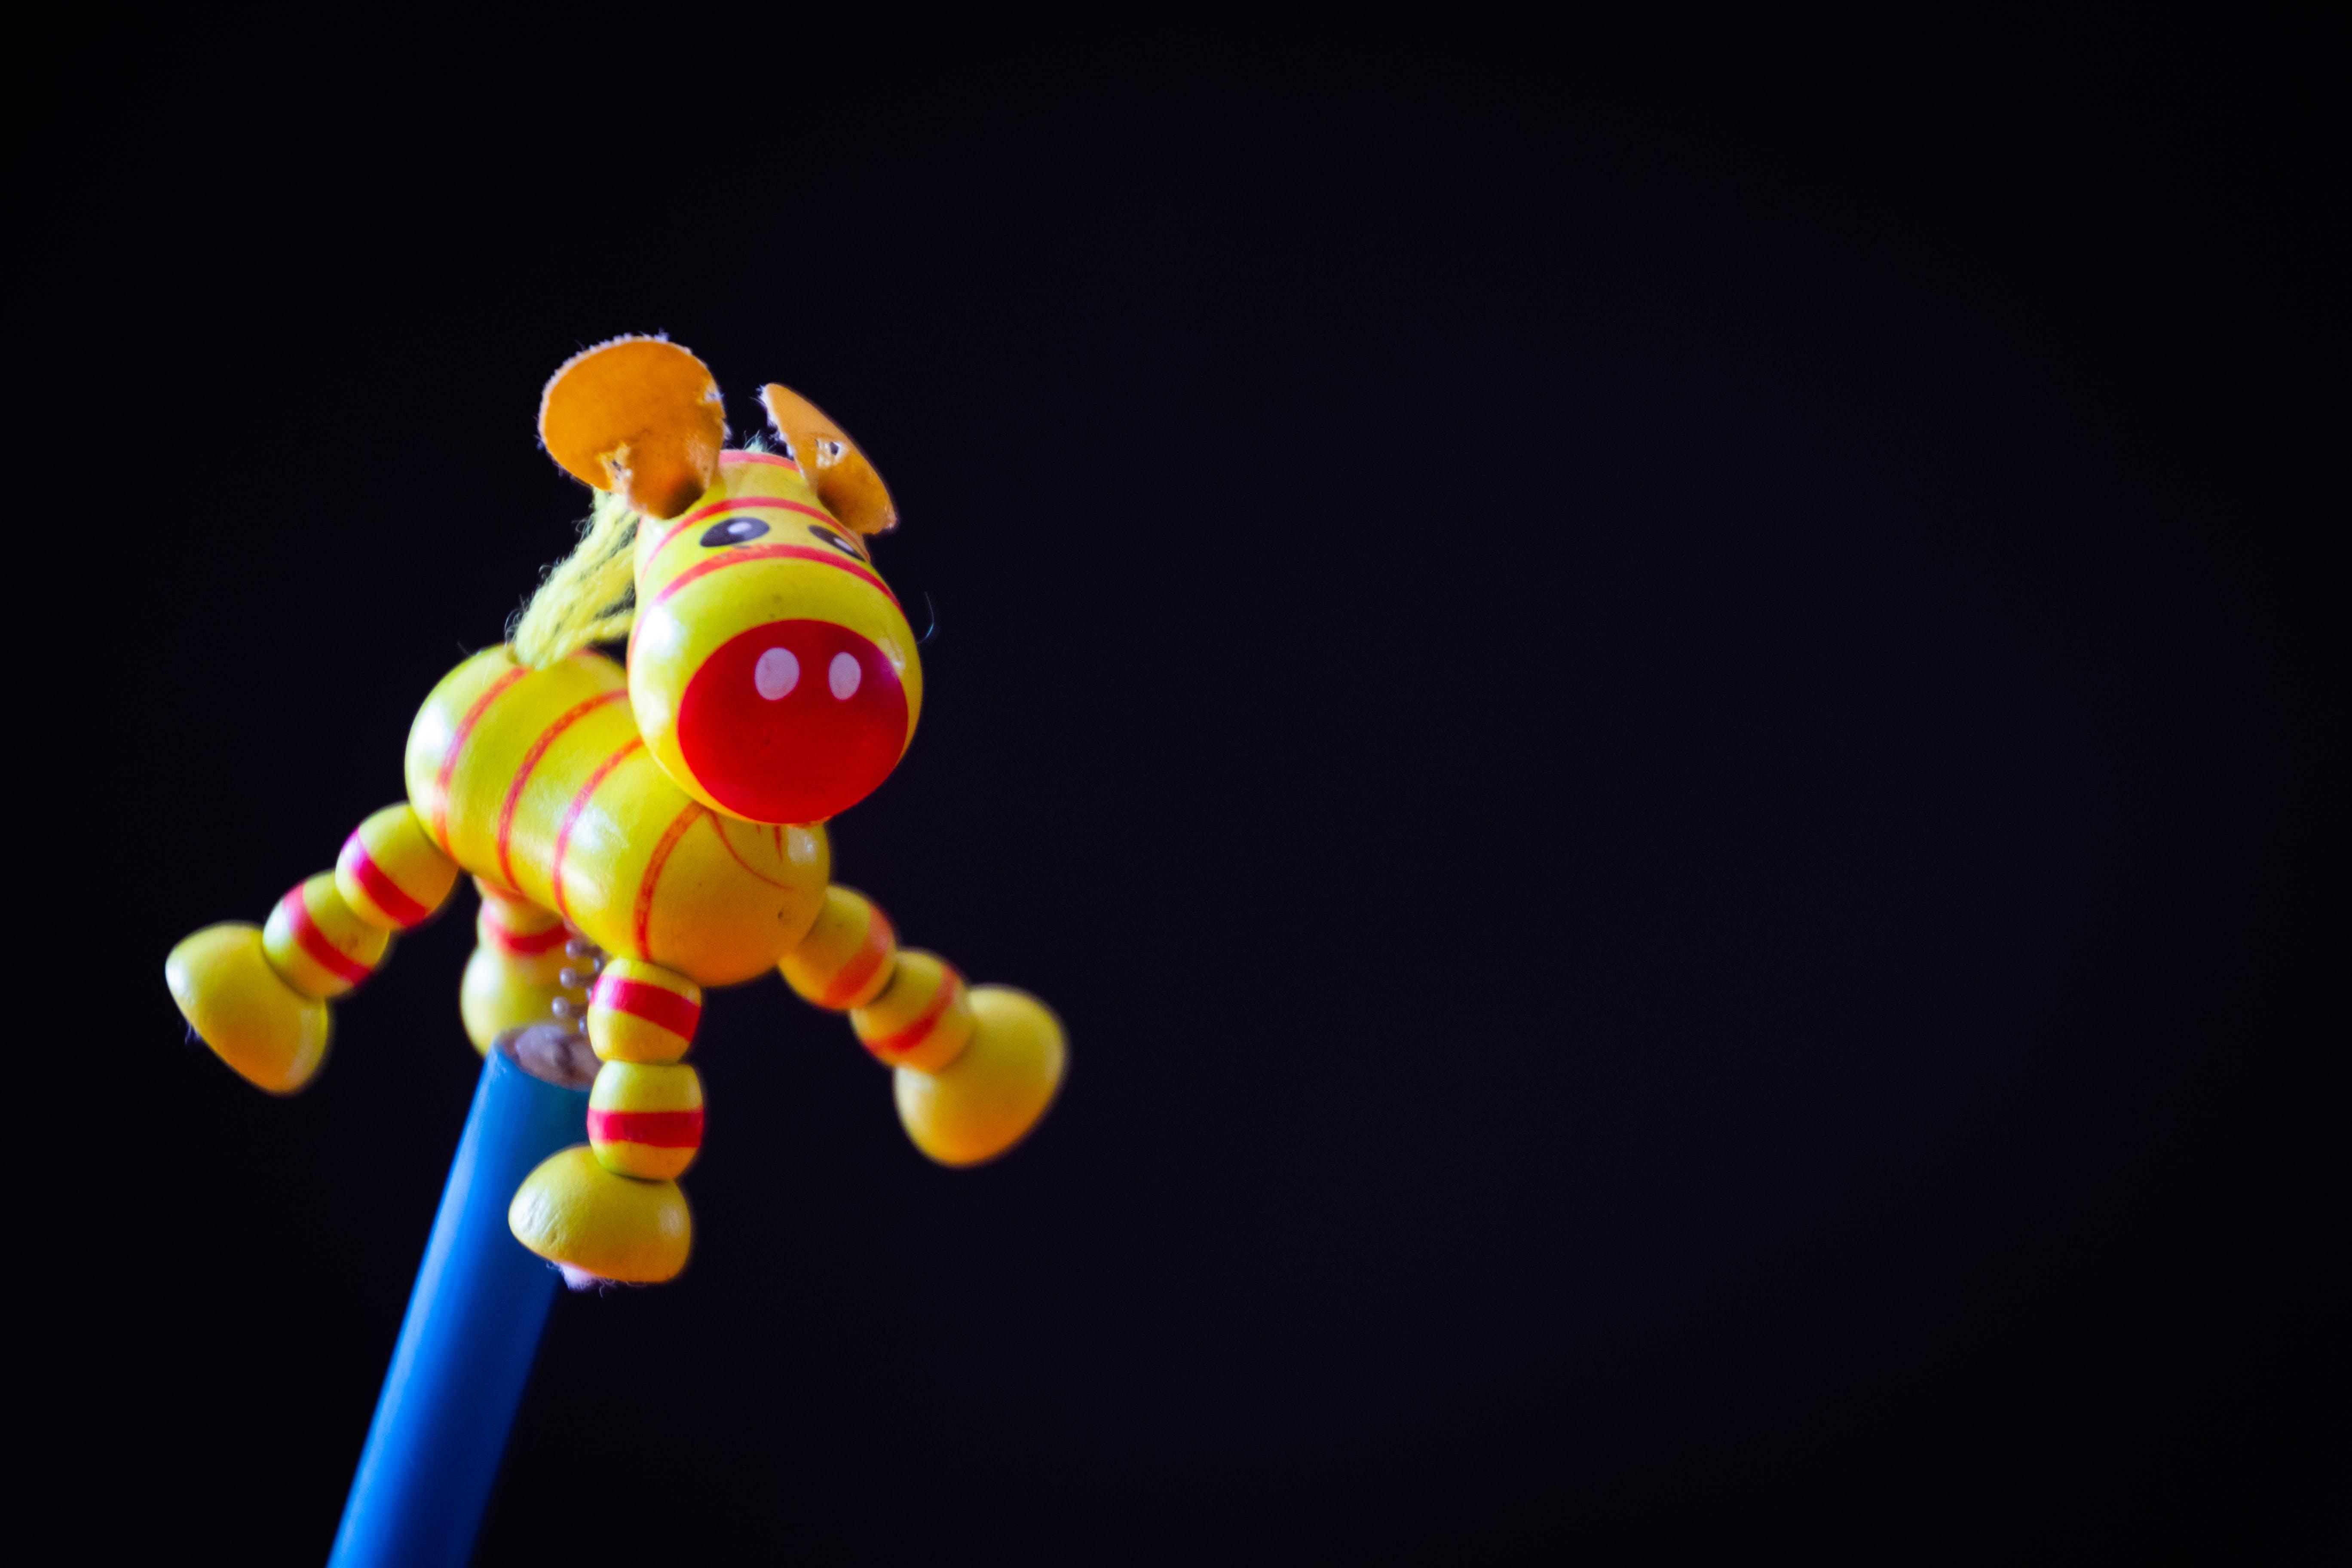 Yellow Donkey Rod Toy